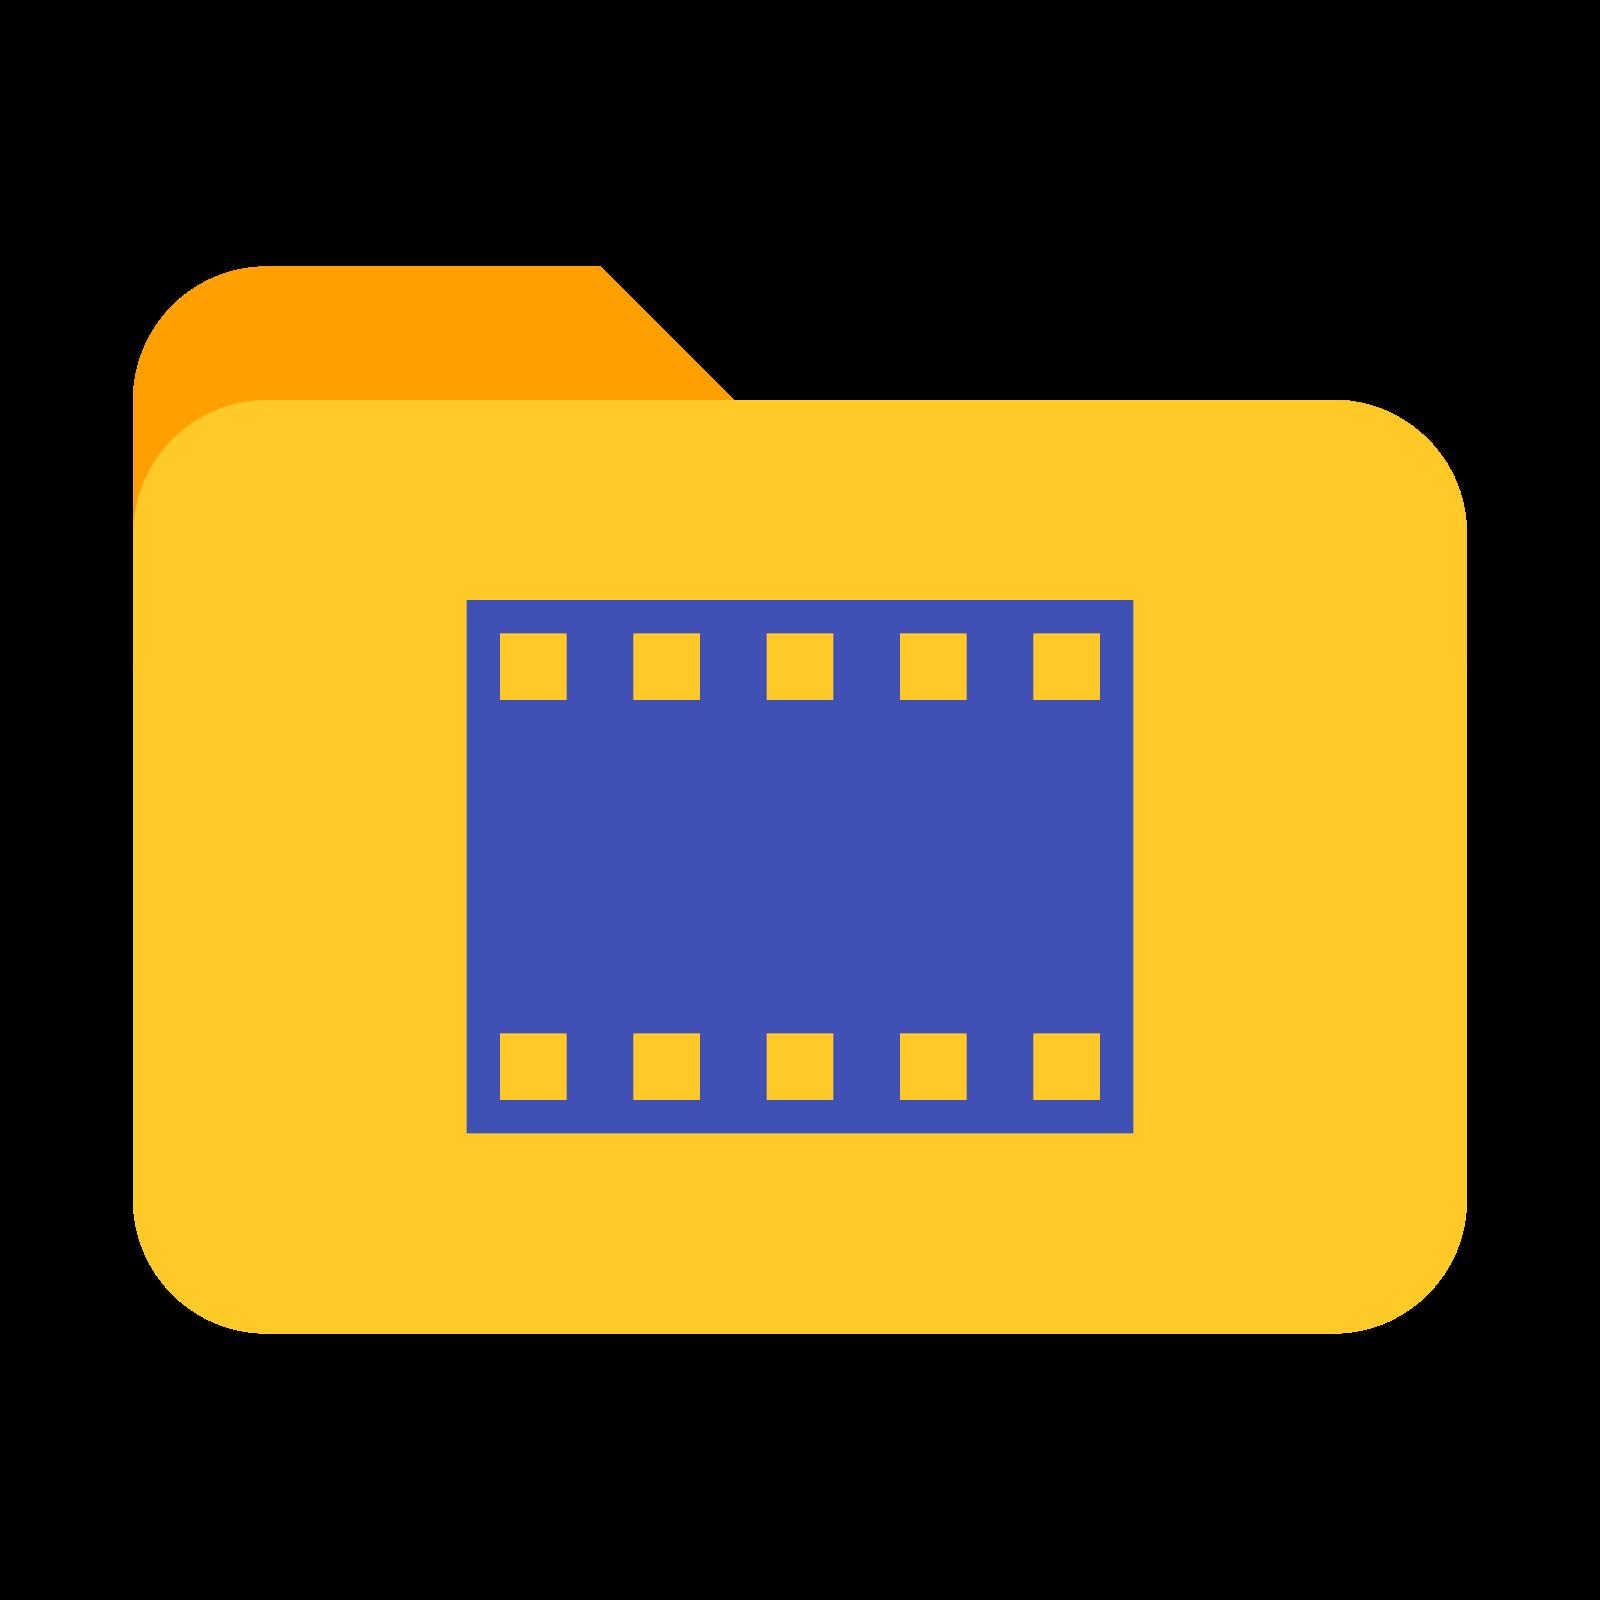 Folder filmy icon